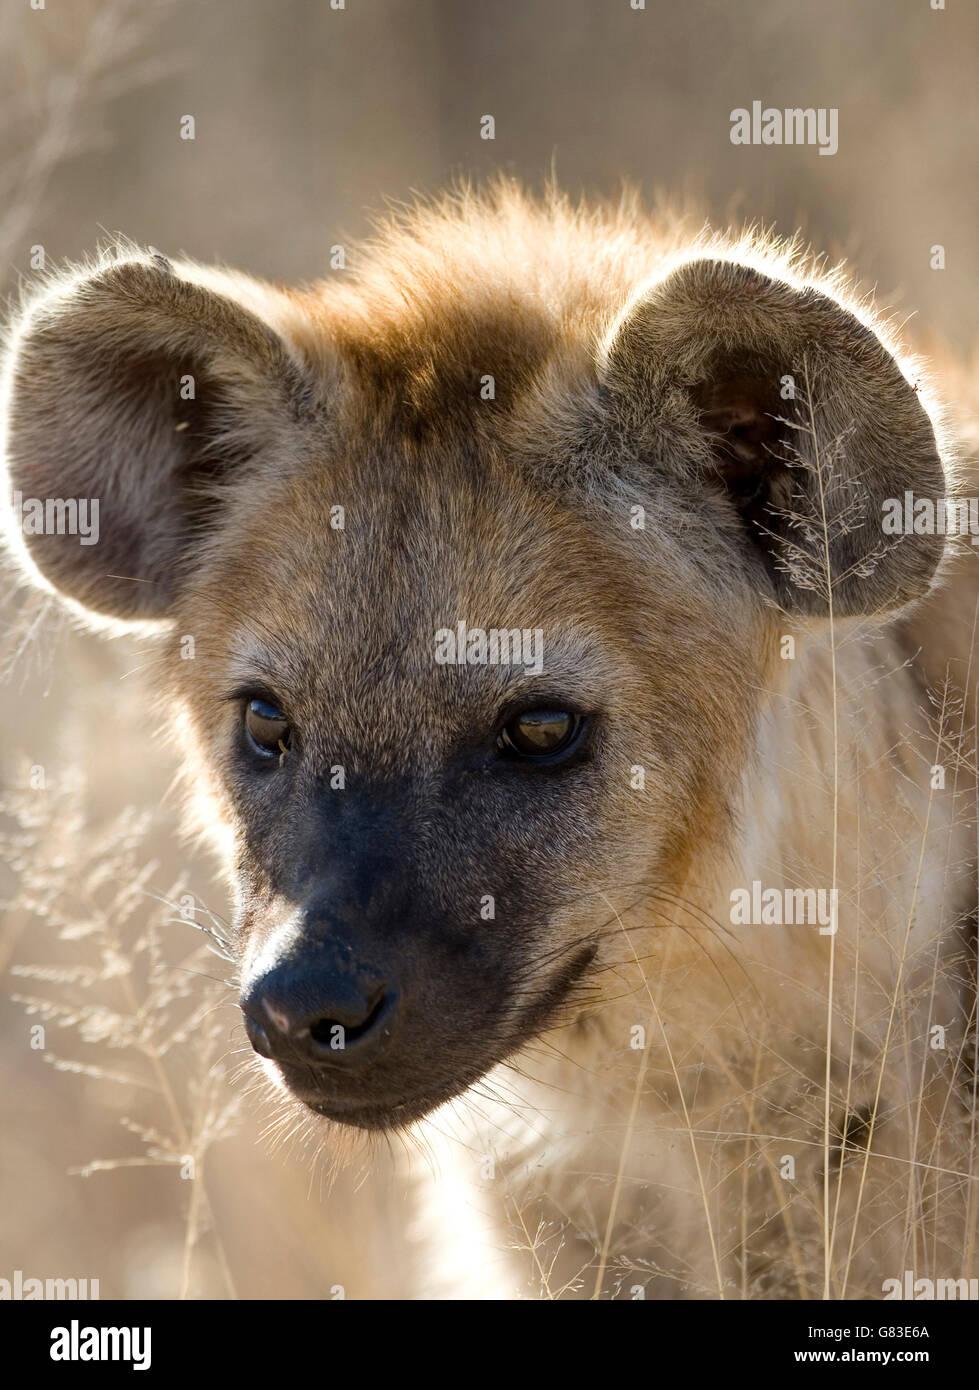 Spotted hyena (Crocuta crocuta), Kruger National Park, South Africa - Stock Image